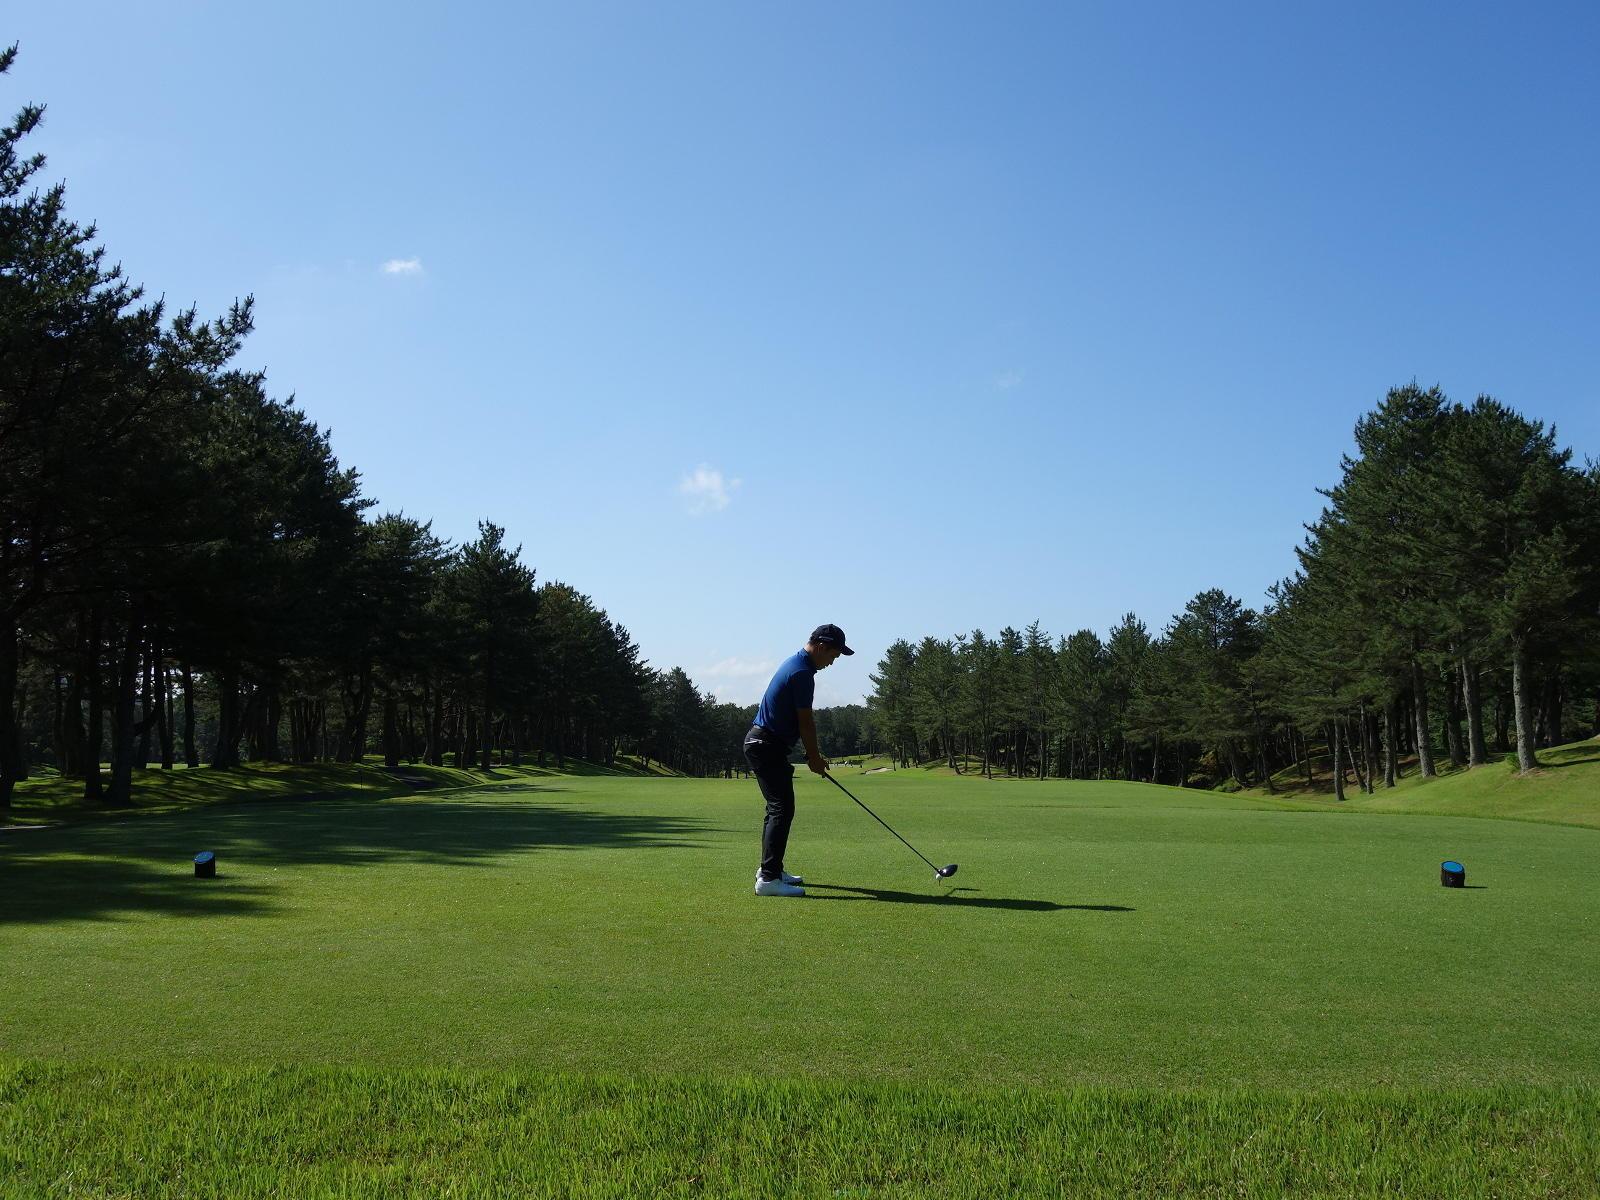 http://www.bs-golf.com/pro/241f4f459125f57846ac0829e0209f35a164b65d.JPG